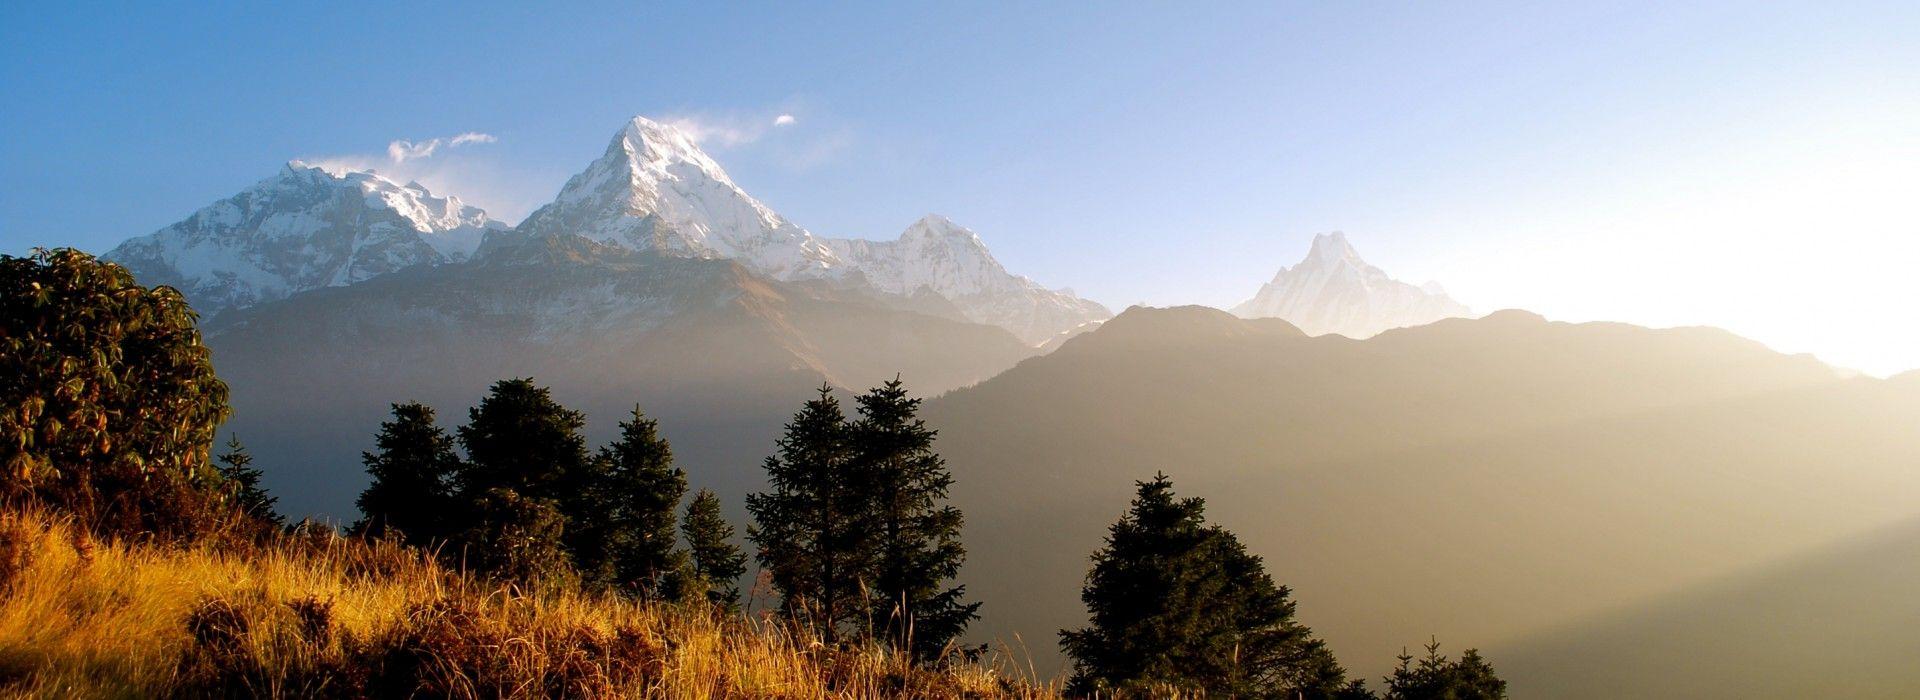 Trekking Tours in Everest Panorama trek